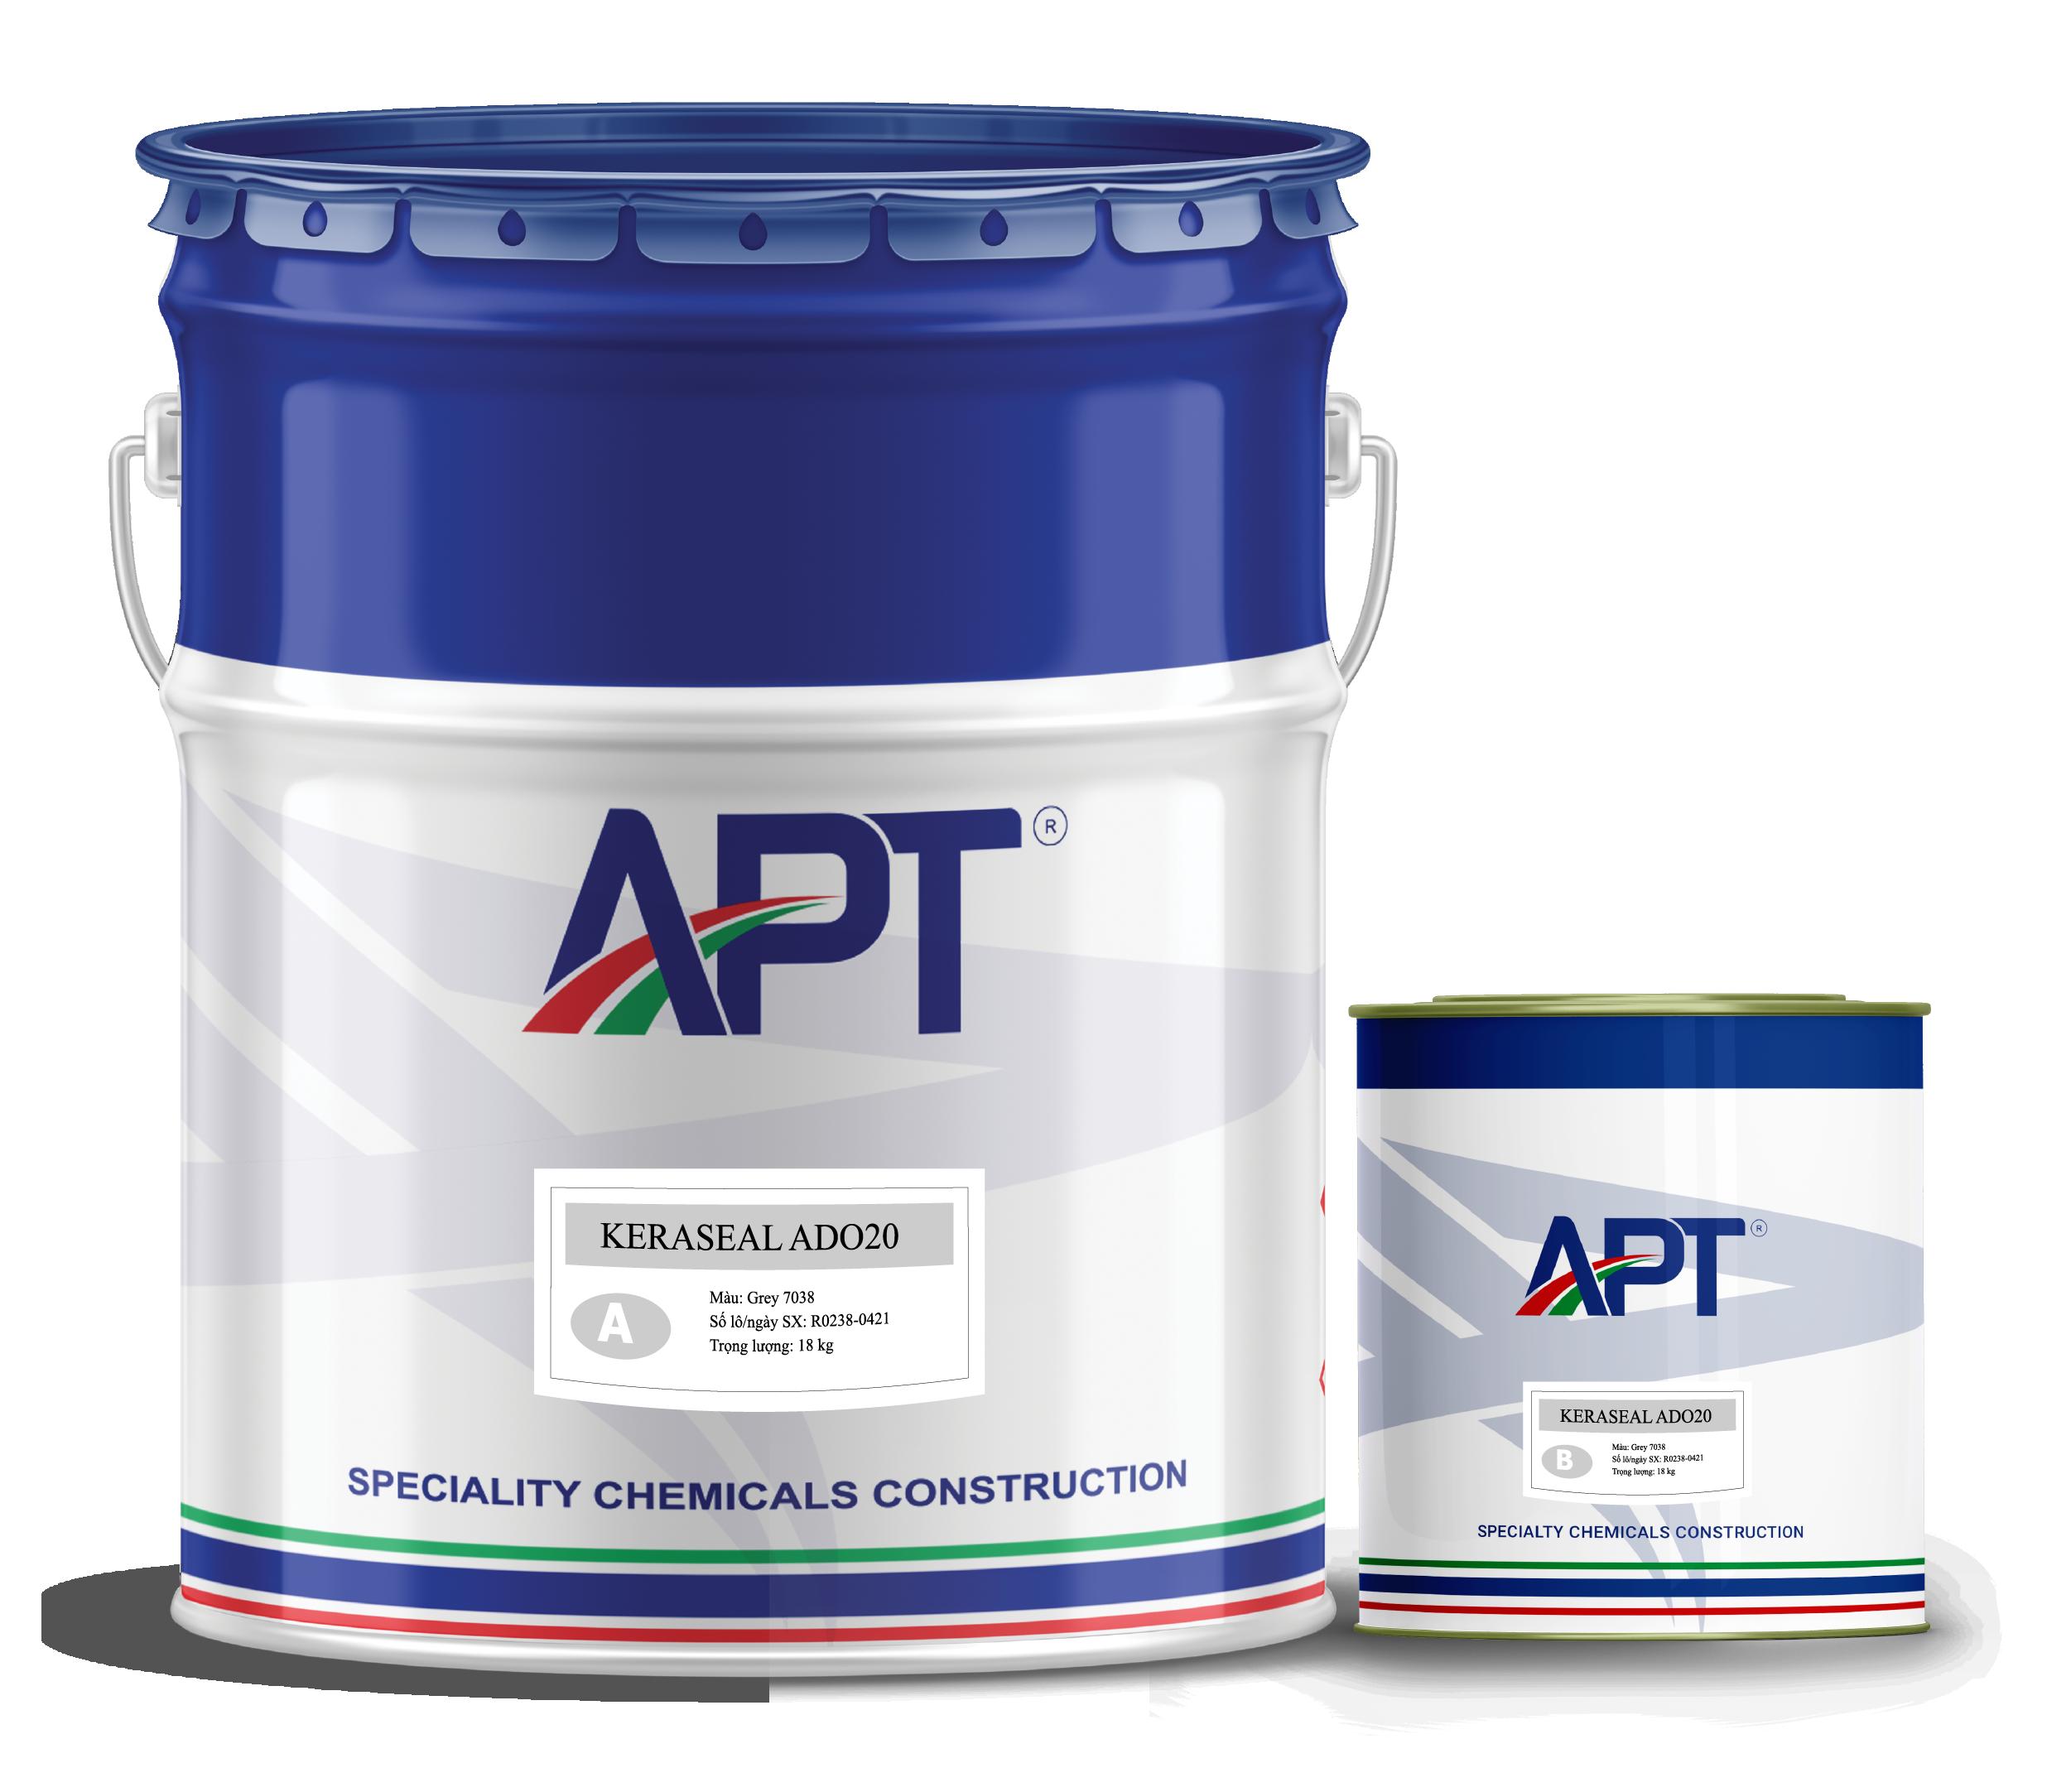 Solvent-based epoxy coating system KERASEAL ADO20